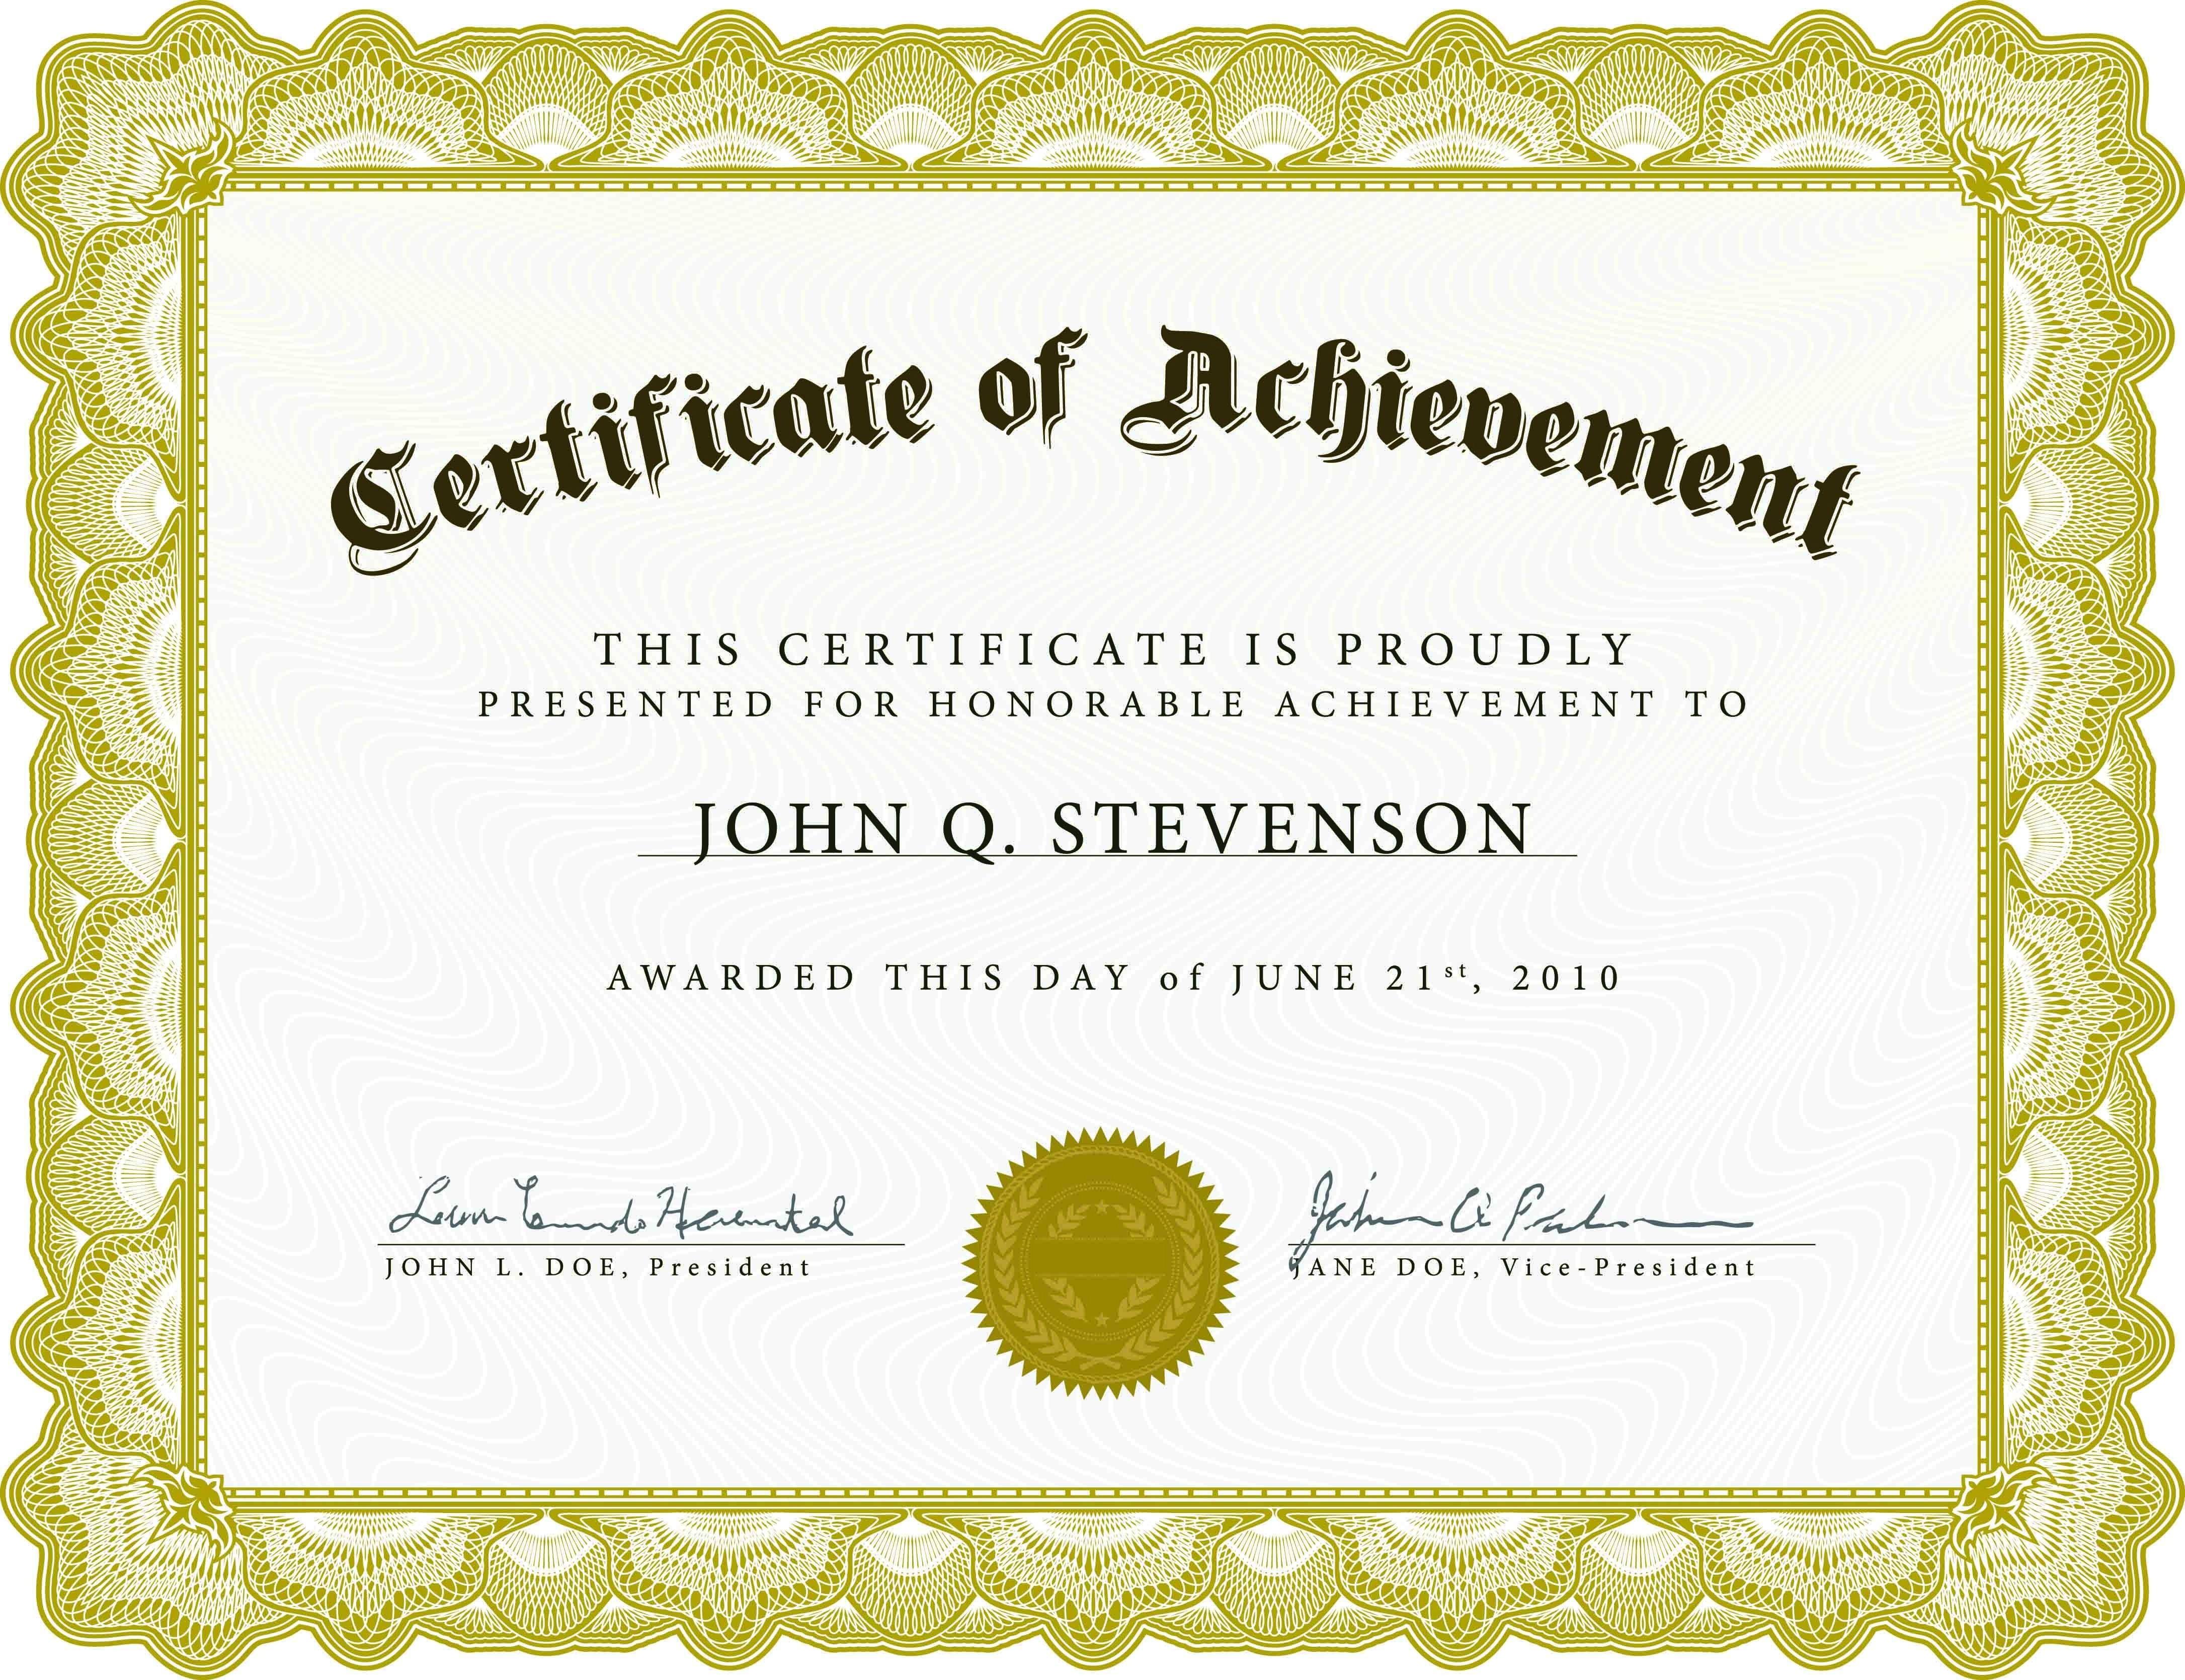 Certificate Template Free Download Microsoft Word  – Elsik Blue Cetane Inside Downloadable Certificate Templates For Microsoft Word